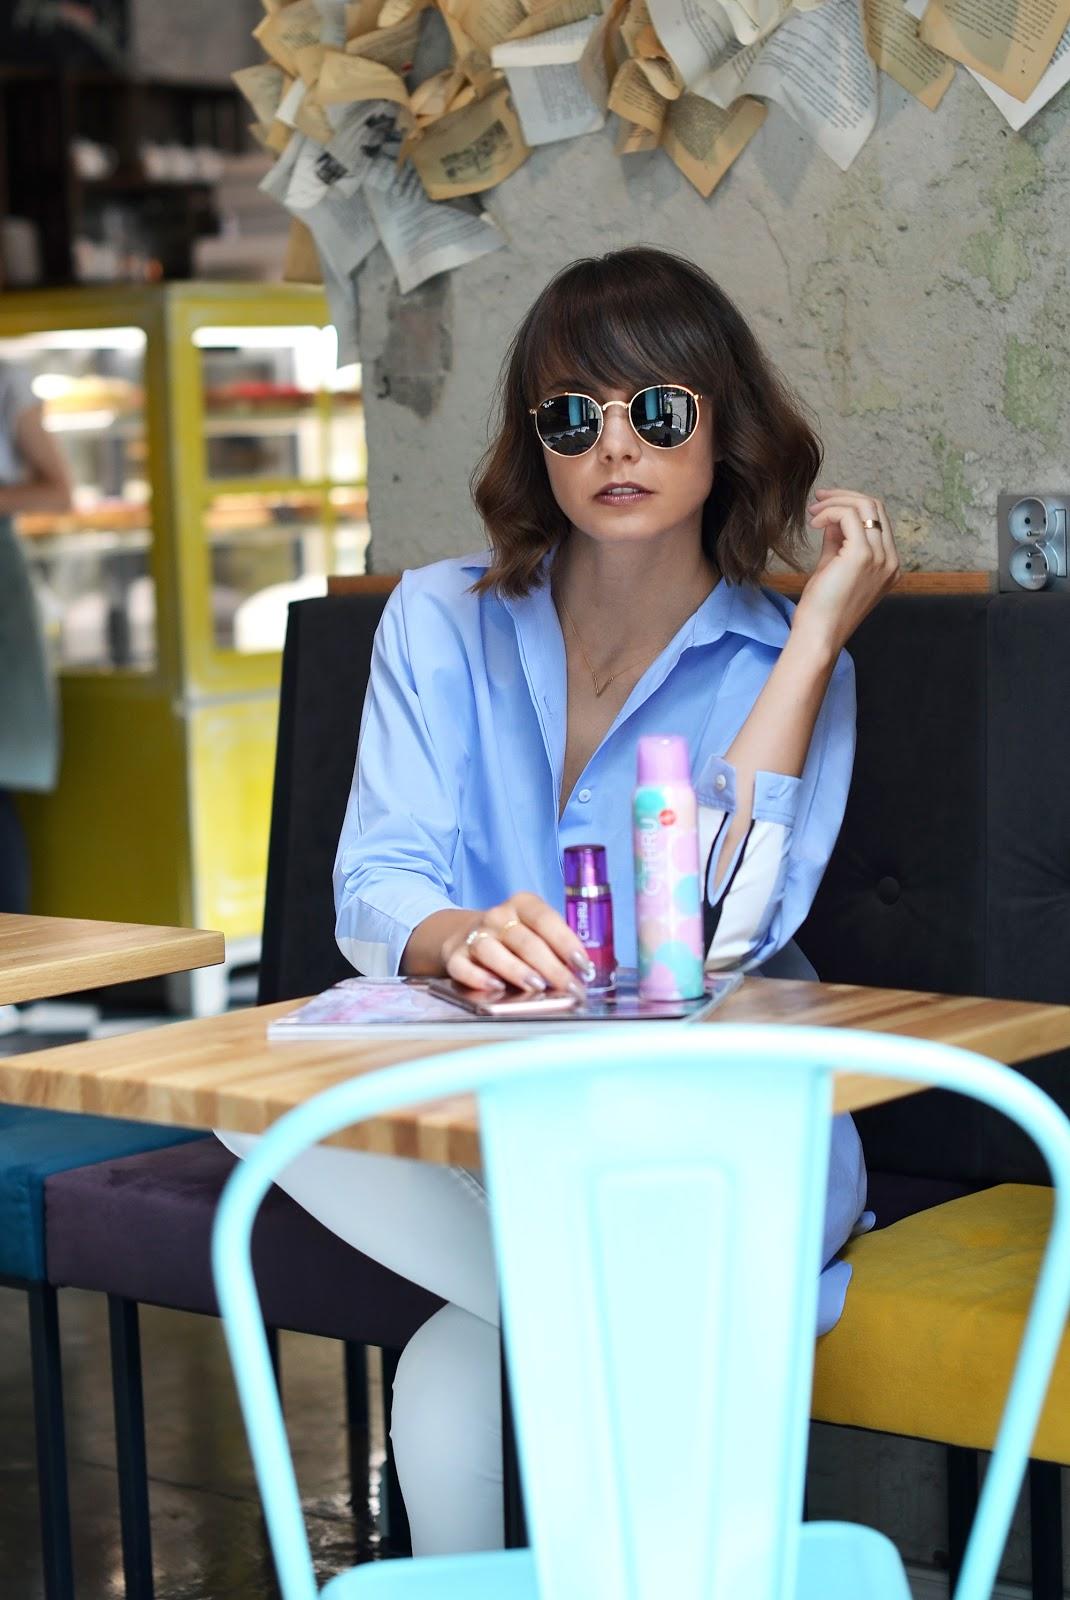 krakow | knajpka | kawiarnia | sesja w kawiarni | blogerka modowa